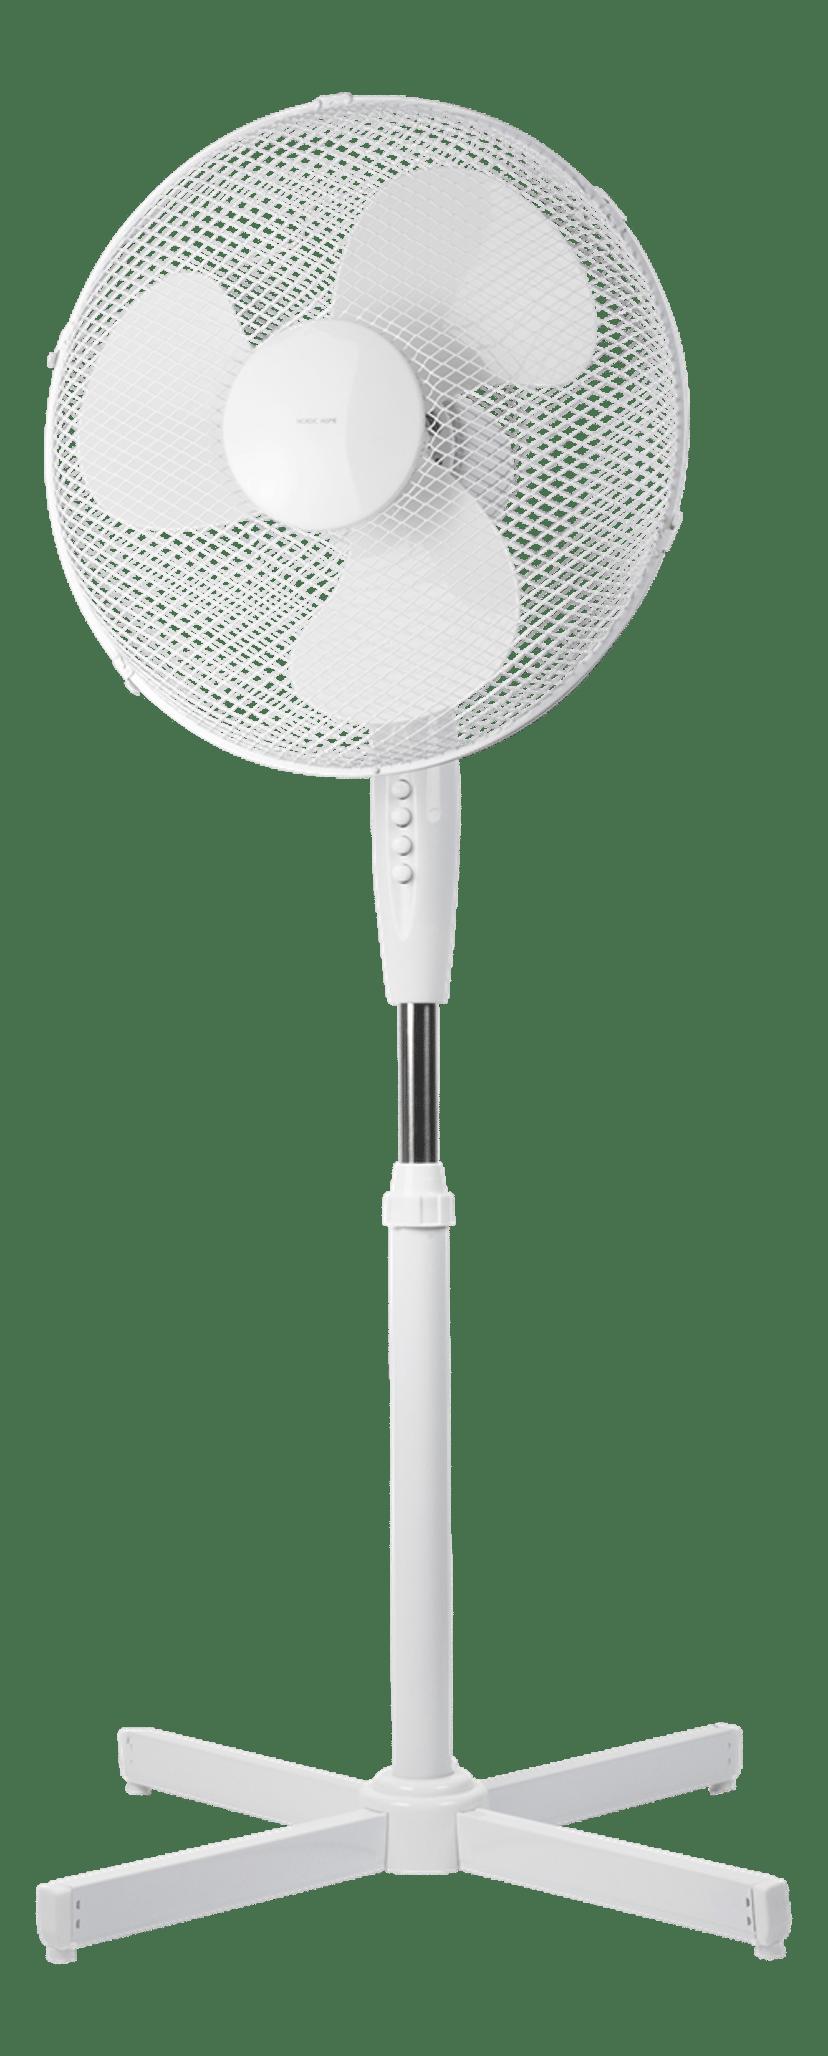 Nordic Home Floor Fan 410Mm 3-Speed White